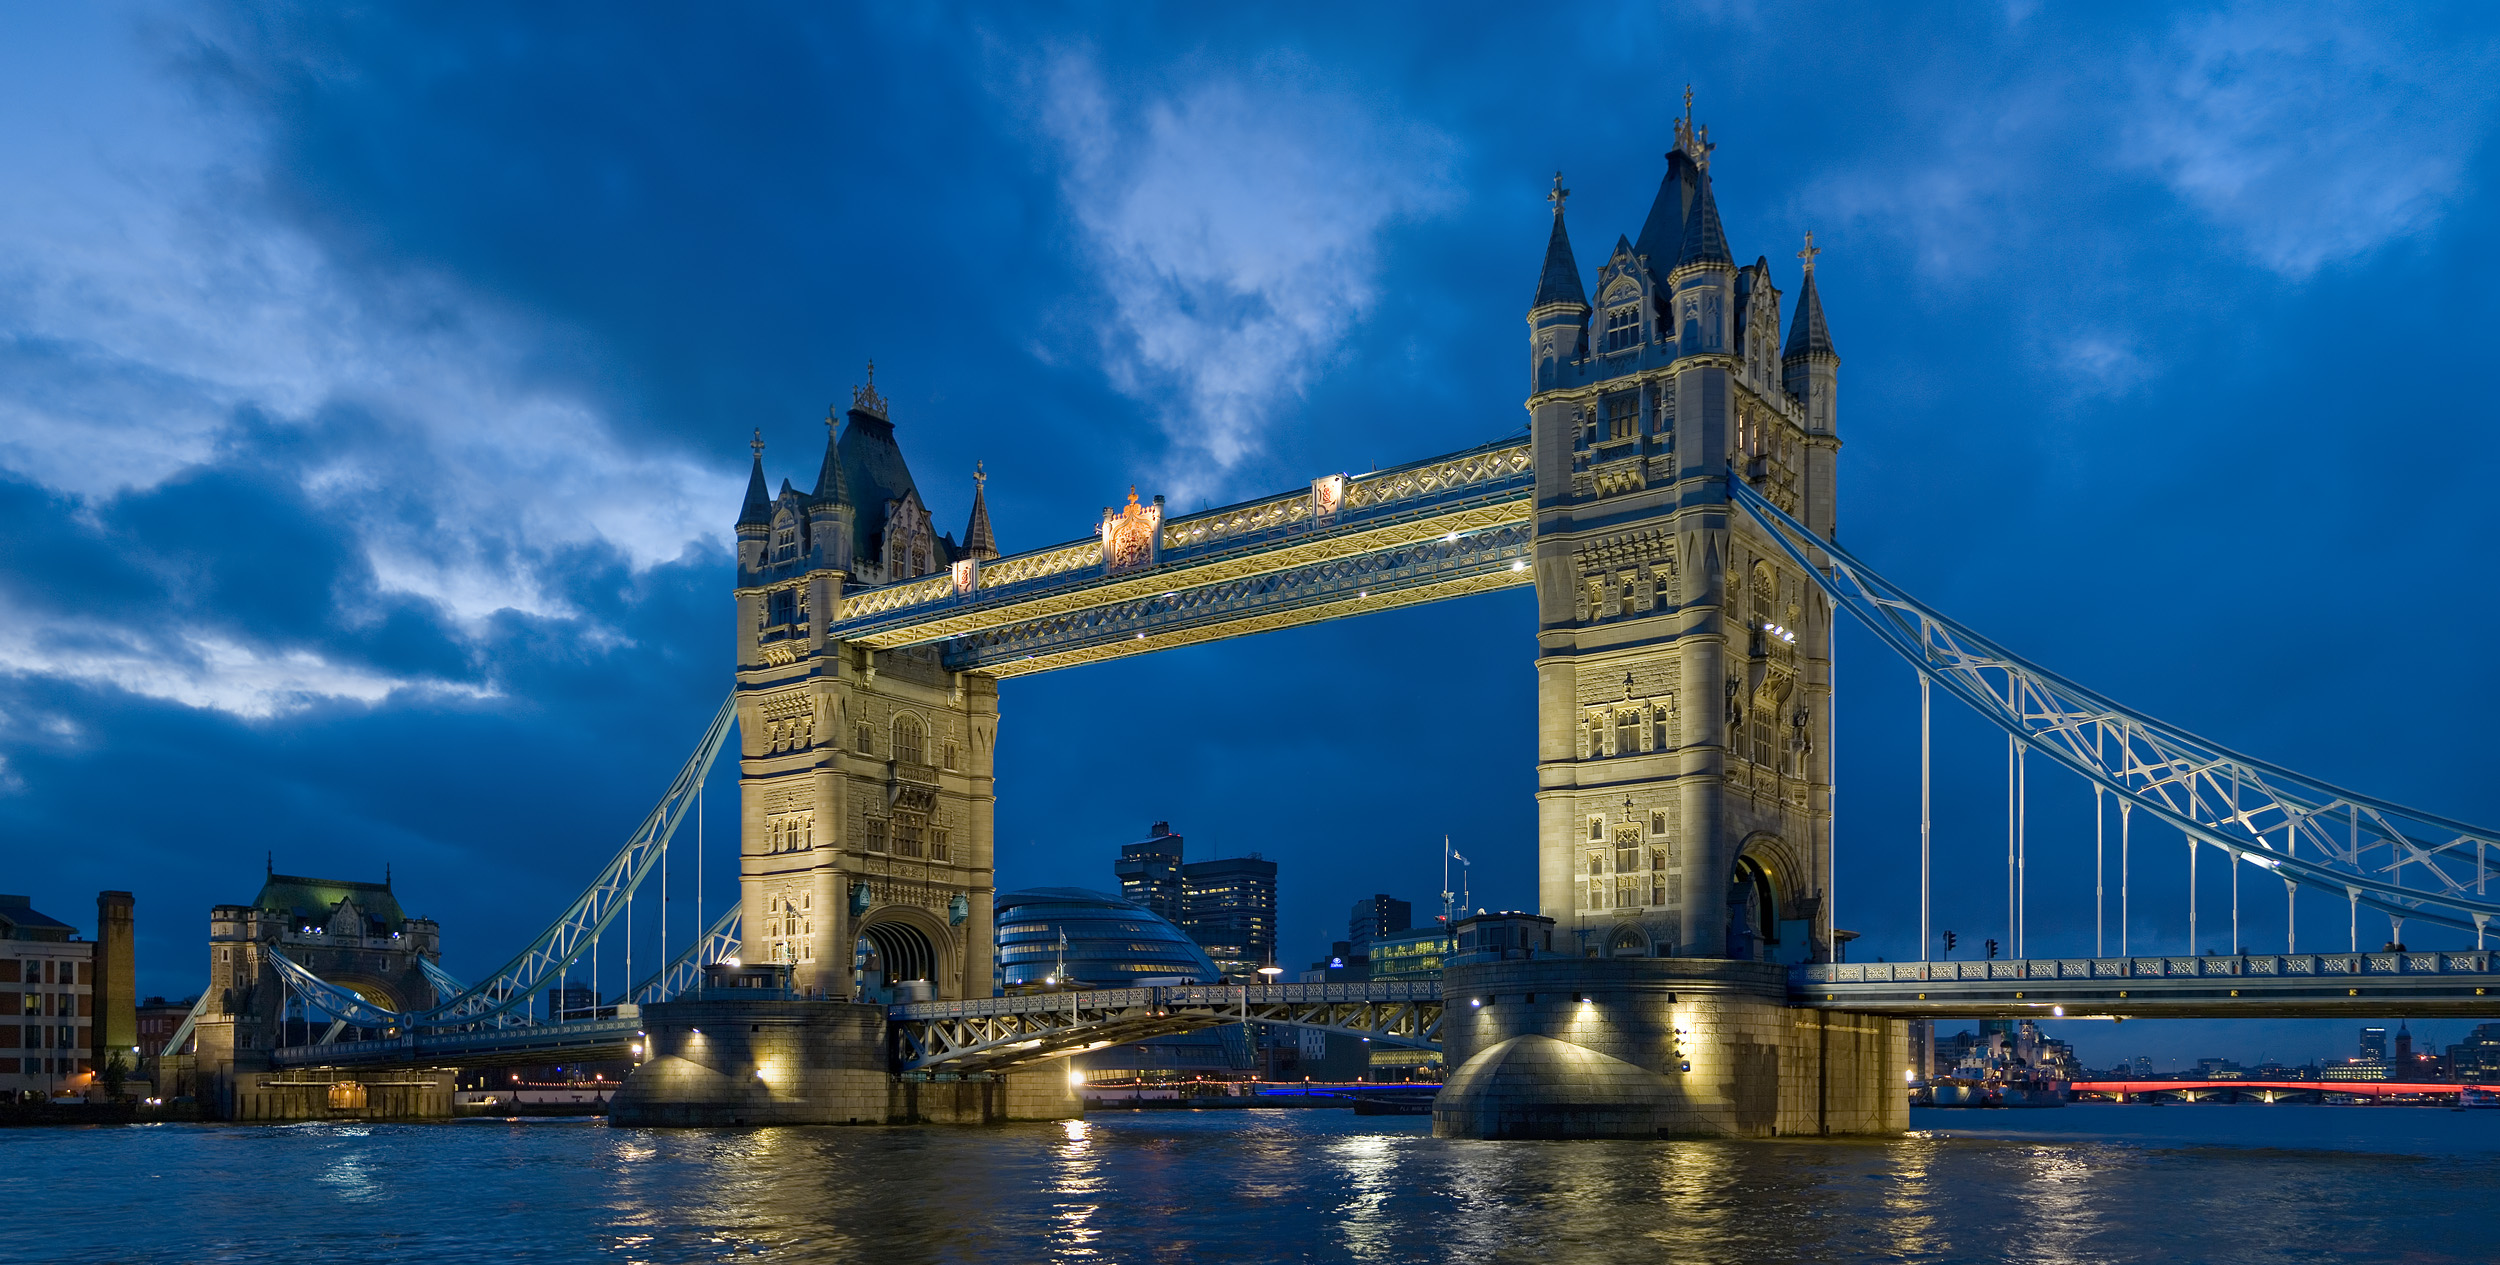 Tower_bridge_London_Twilight_-_November_2006.jpeg